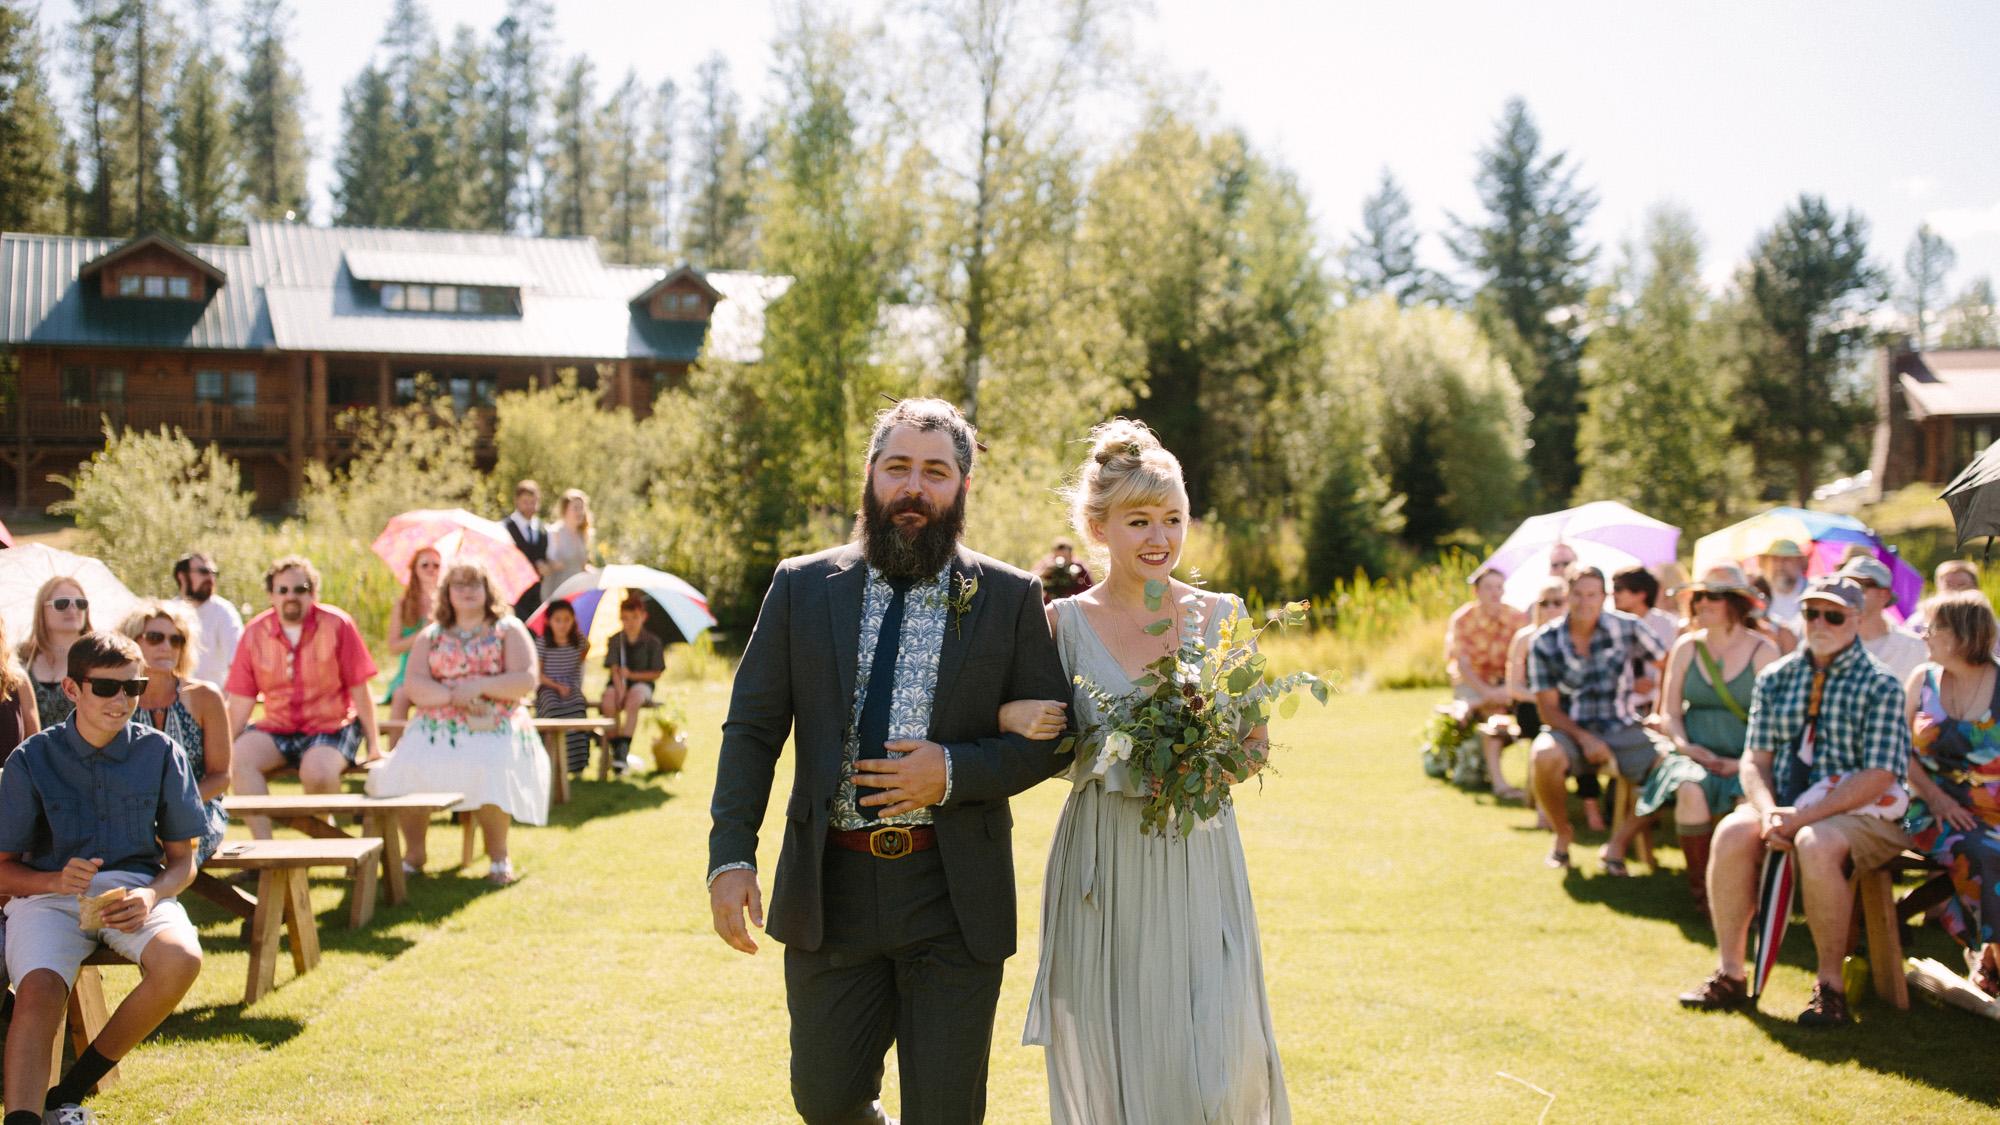 Montana_Wedding_Photos_alec_vanderboom-0081.jpg